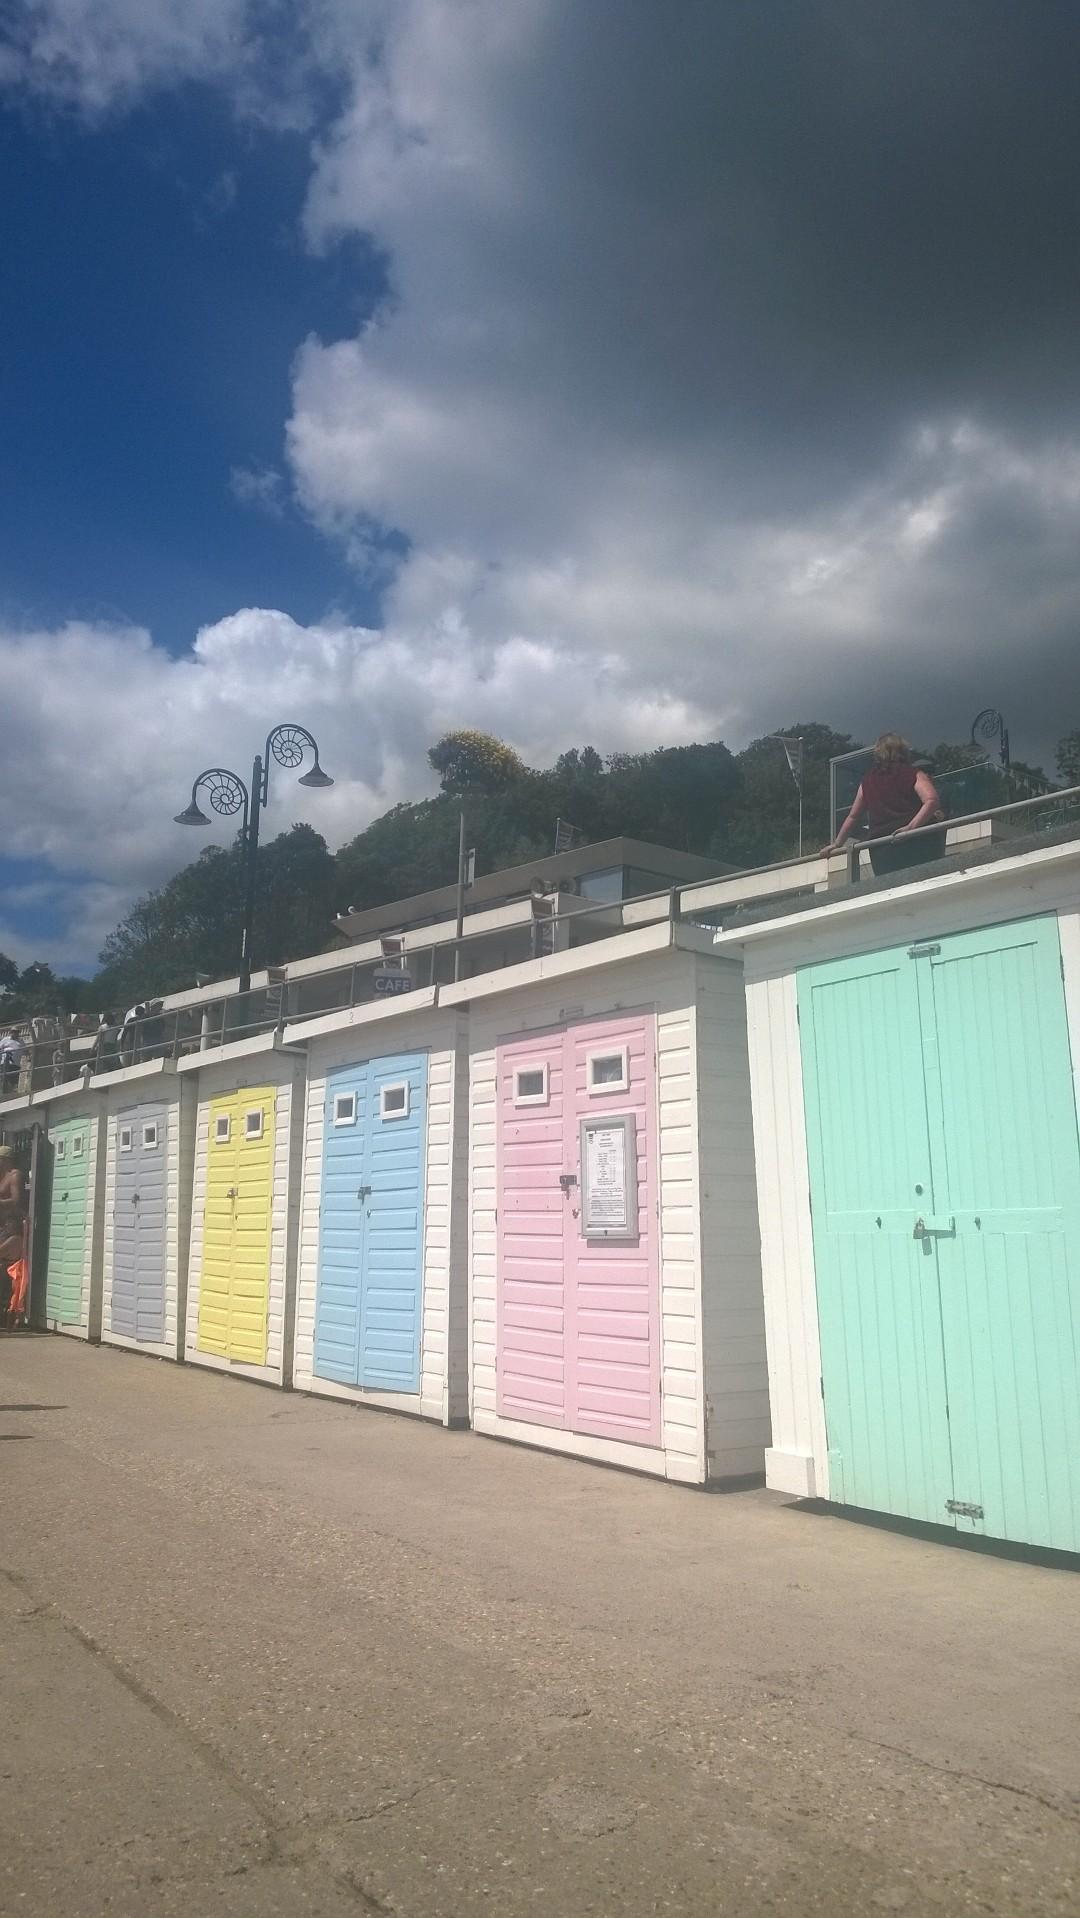 Beach Huts at Lyme Regis